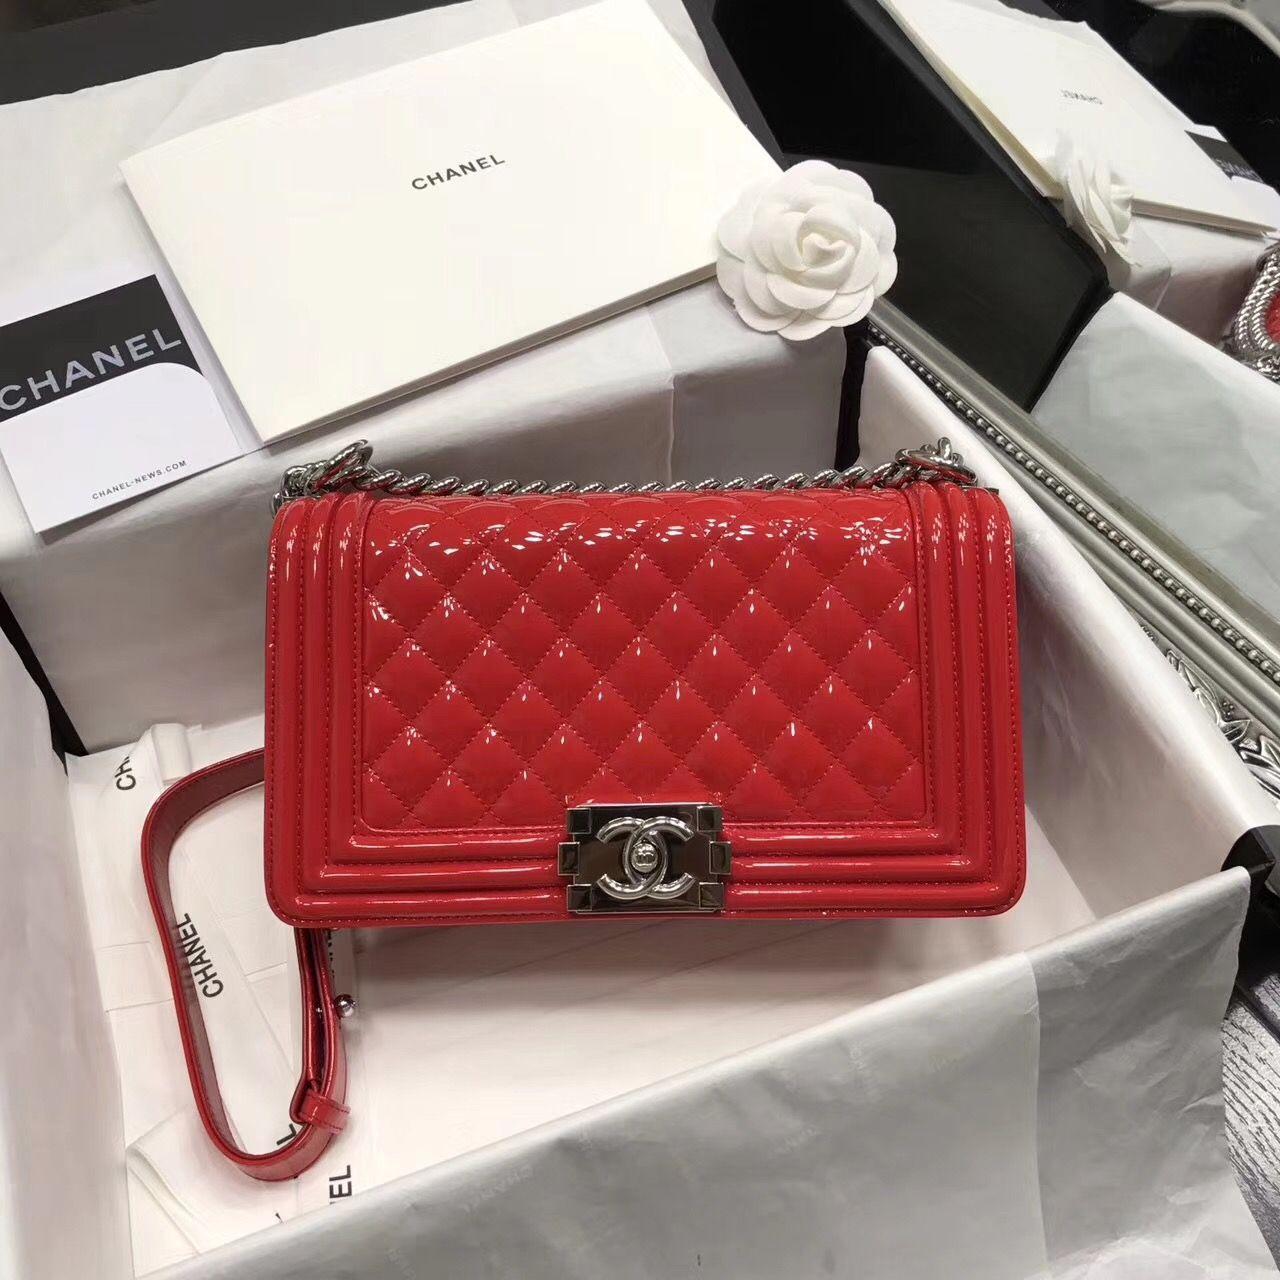 3e9438191d55 Chanel Original Patent Leather Medium Le Boy Flap Bag in Red 25cm ...